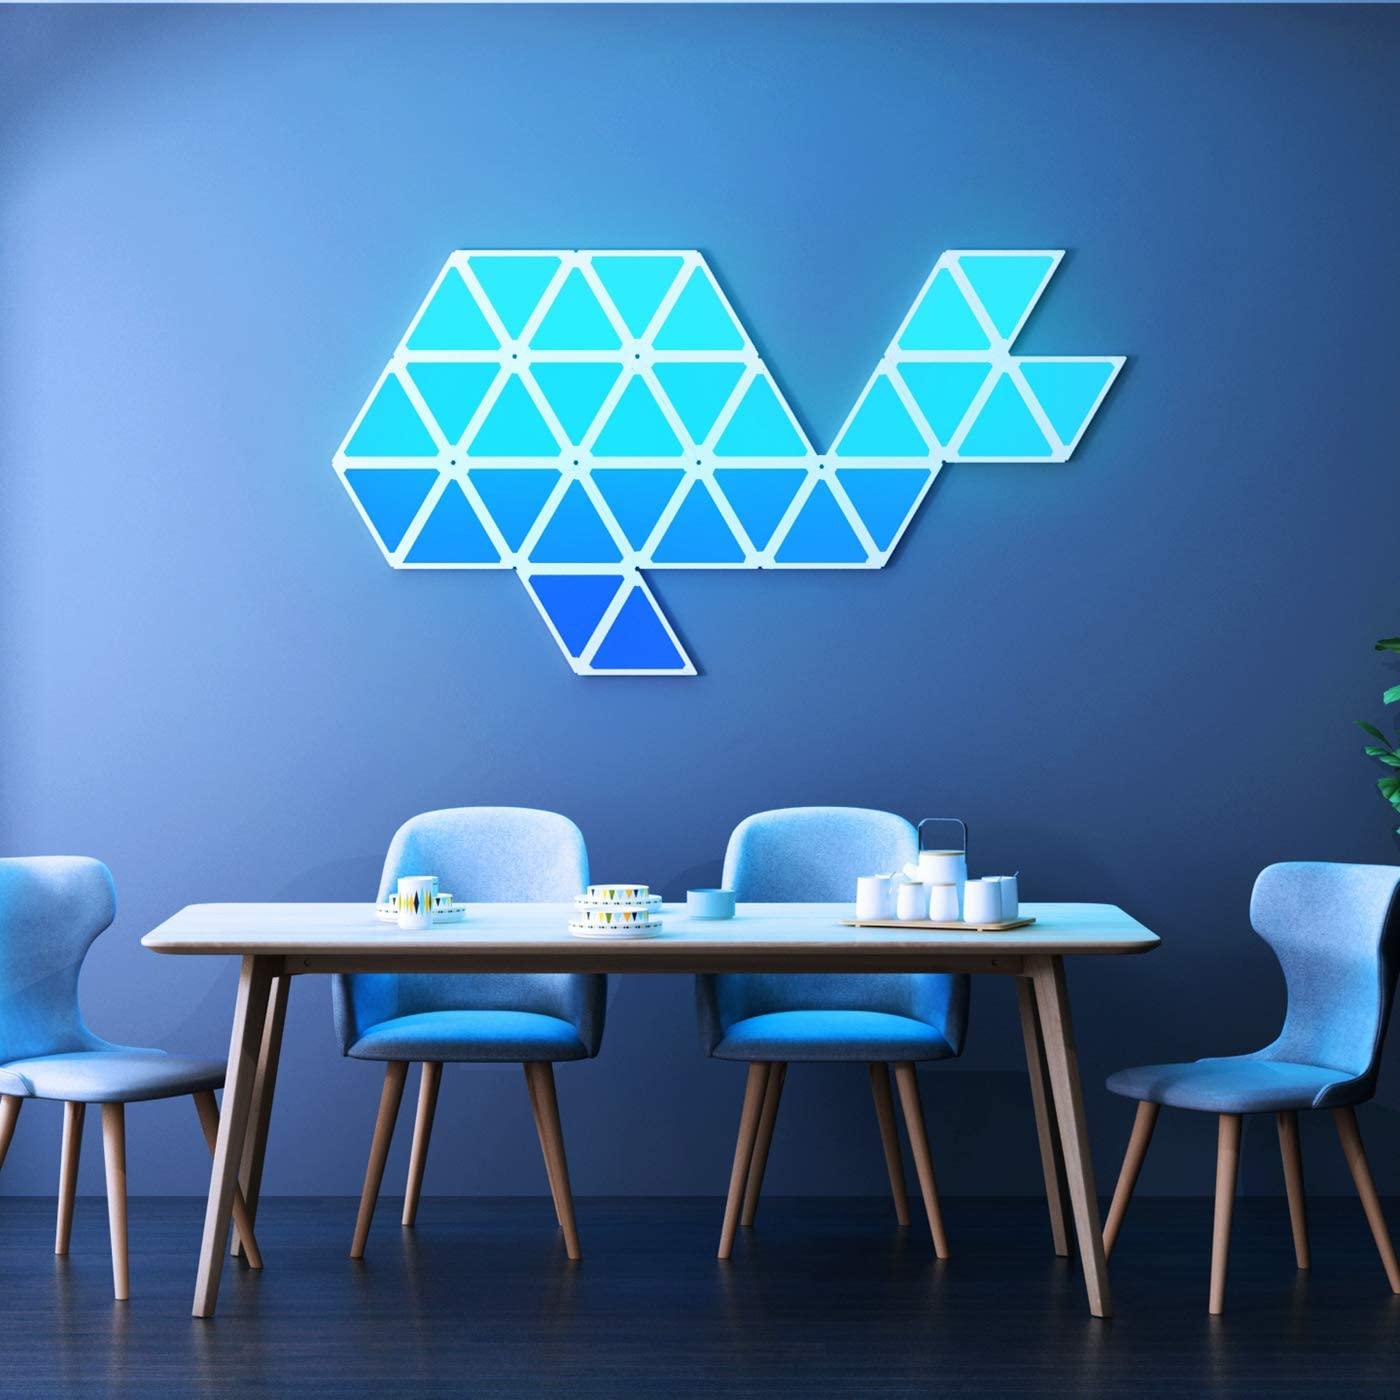 Smart LED Wall Light Tiles Light Panels WiFi Lighting Lamp Rhythm Edition Smarter Kit for Office Home Decoration